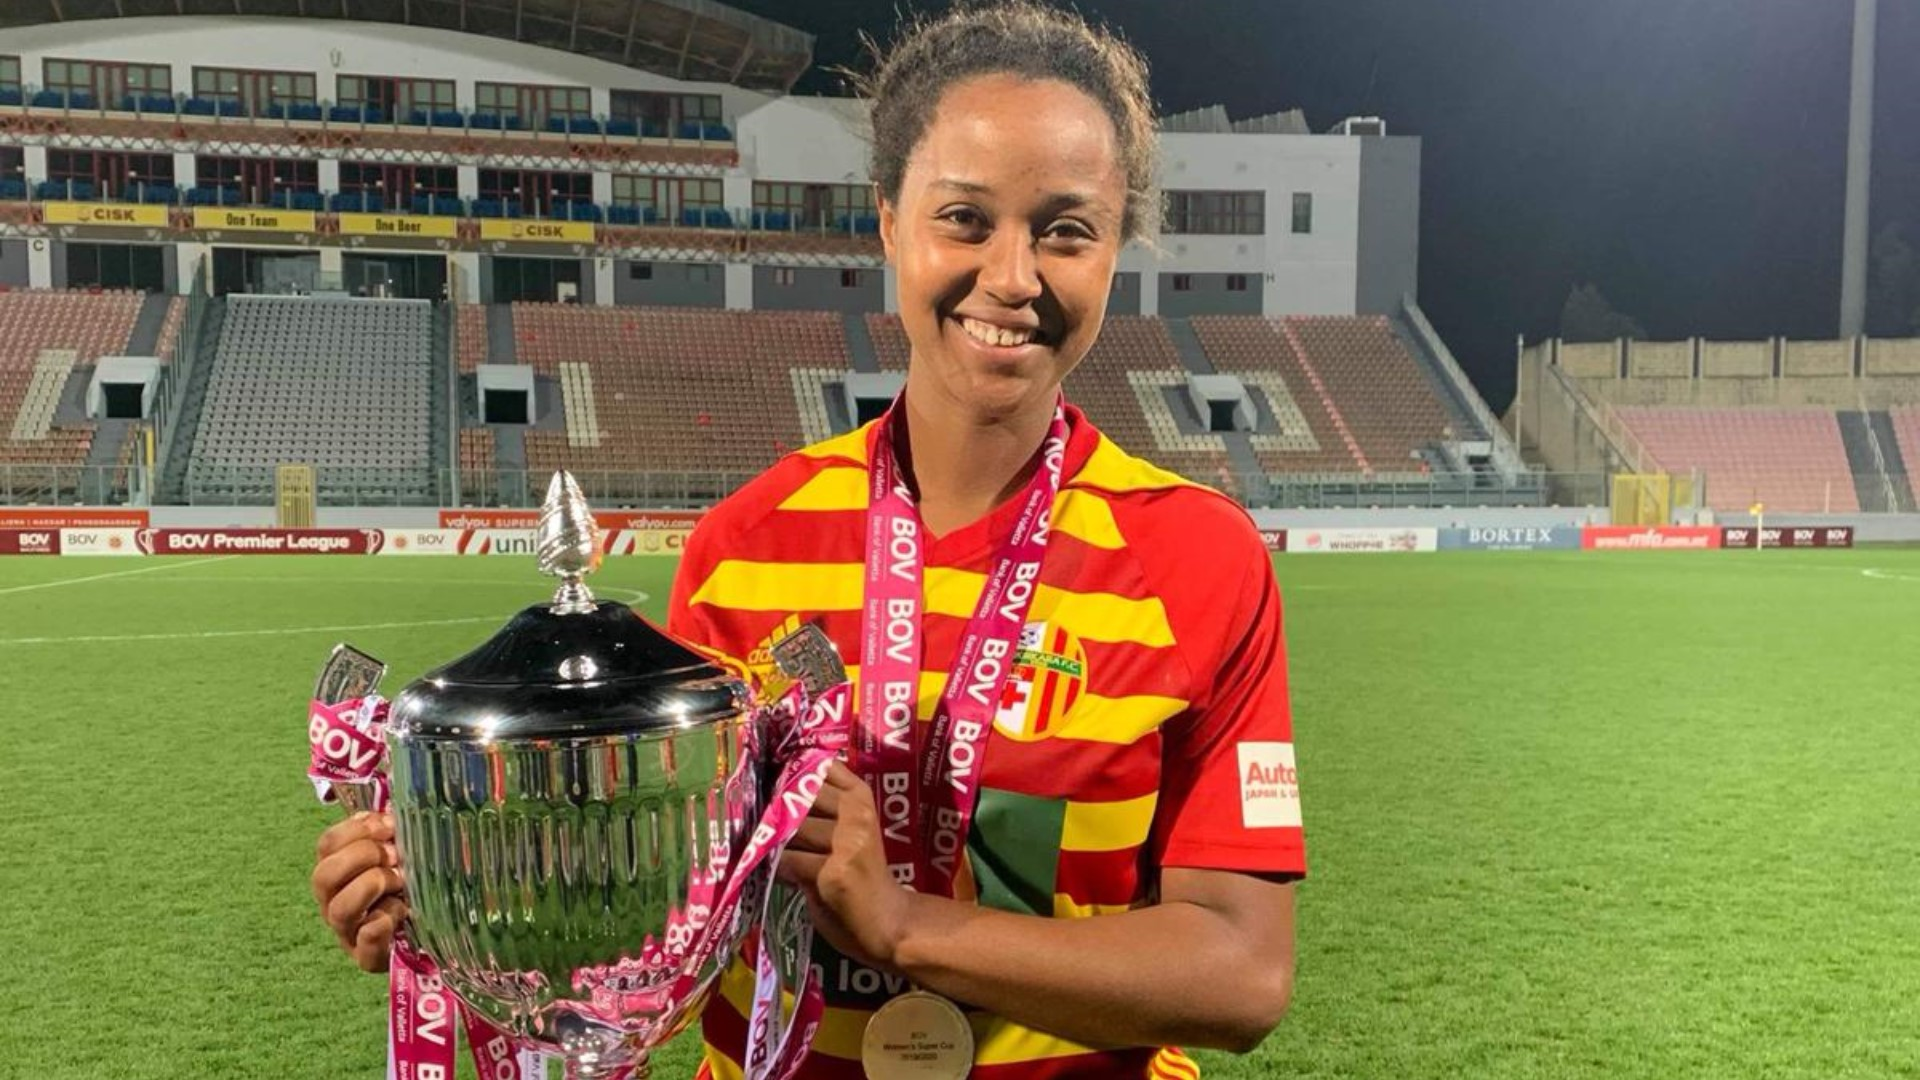 Anu's Birkirkara retain BOV Women's League title as Abera emerges top scorer in Malta